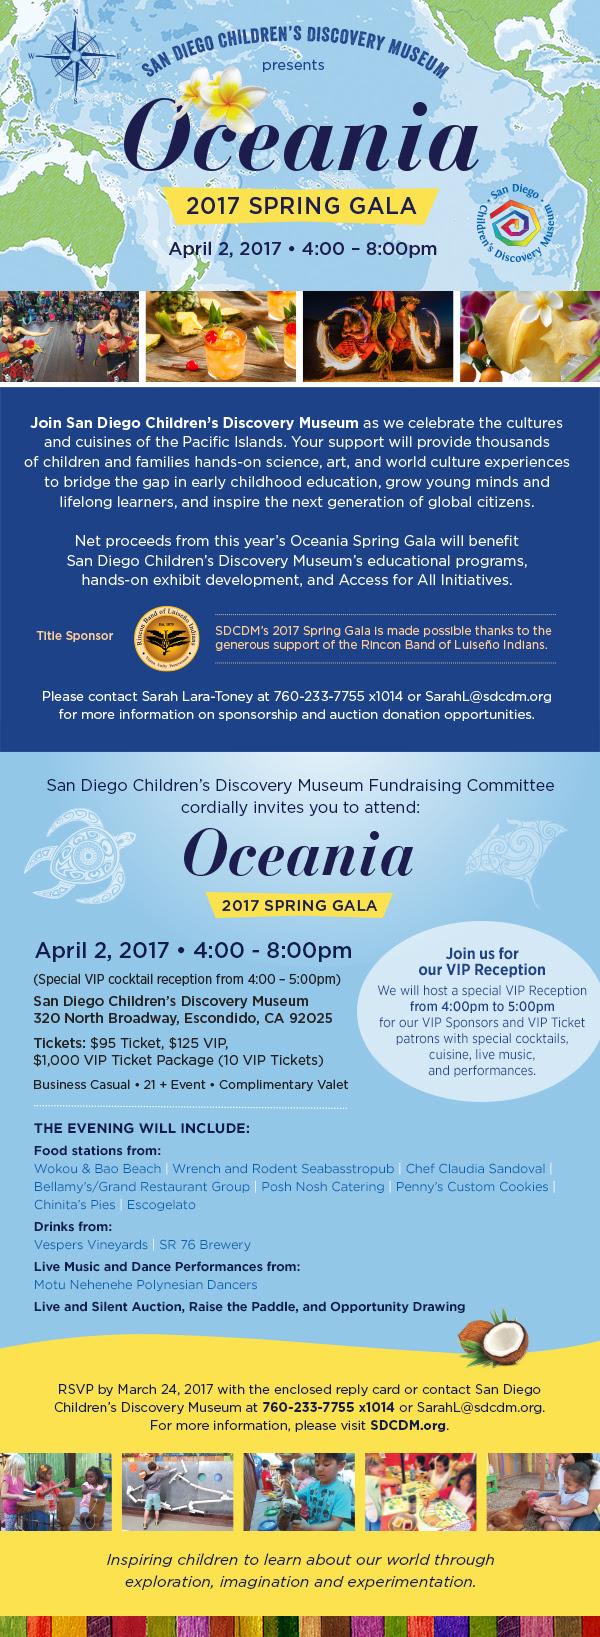 2017 Spring Gala: Oceania